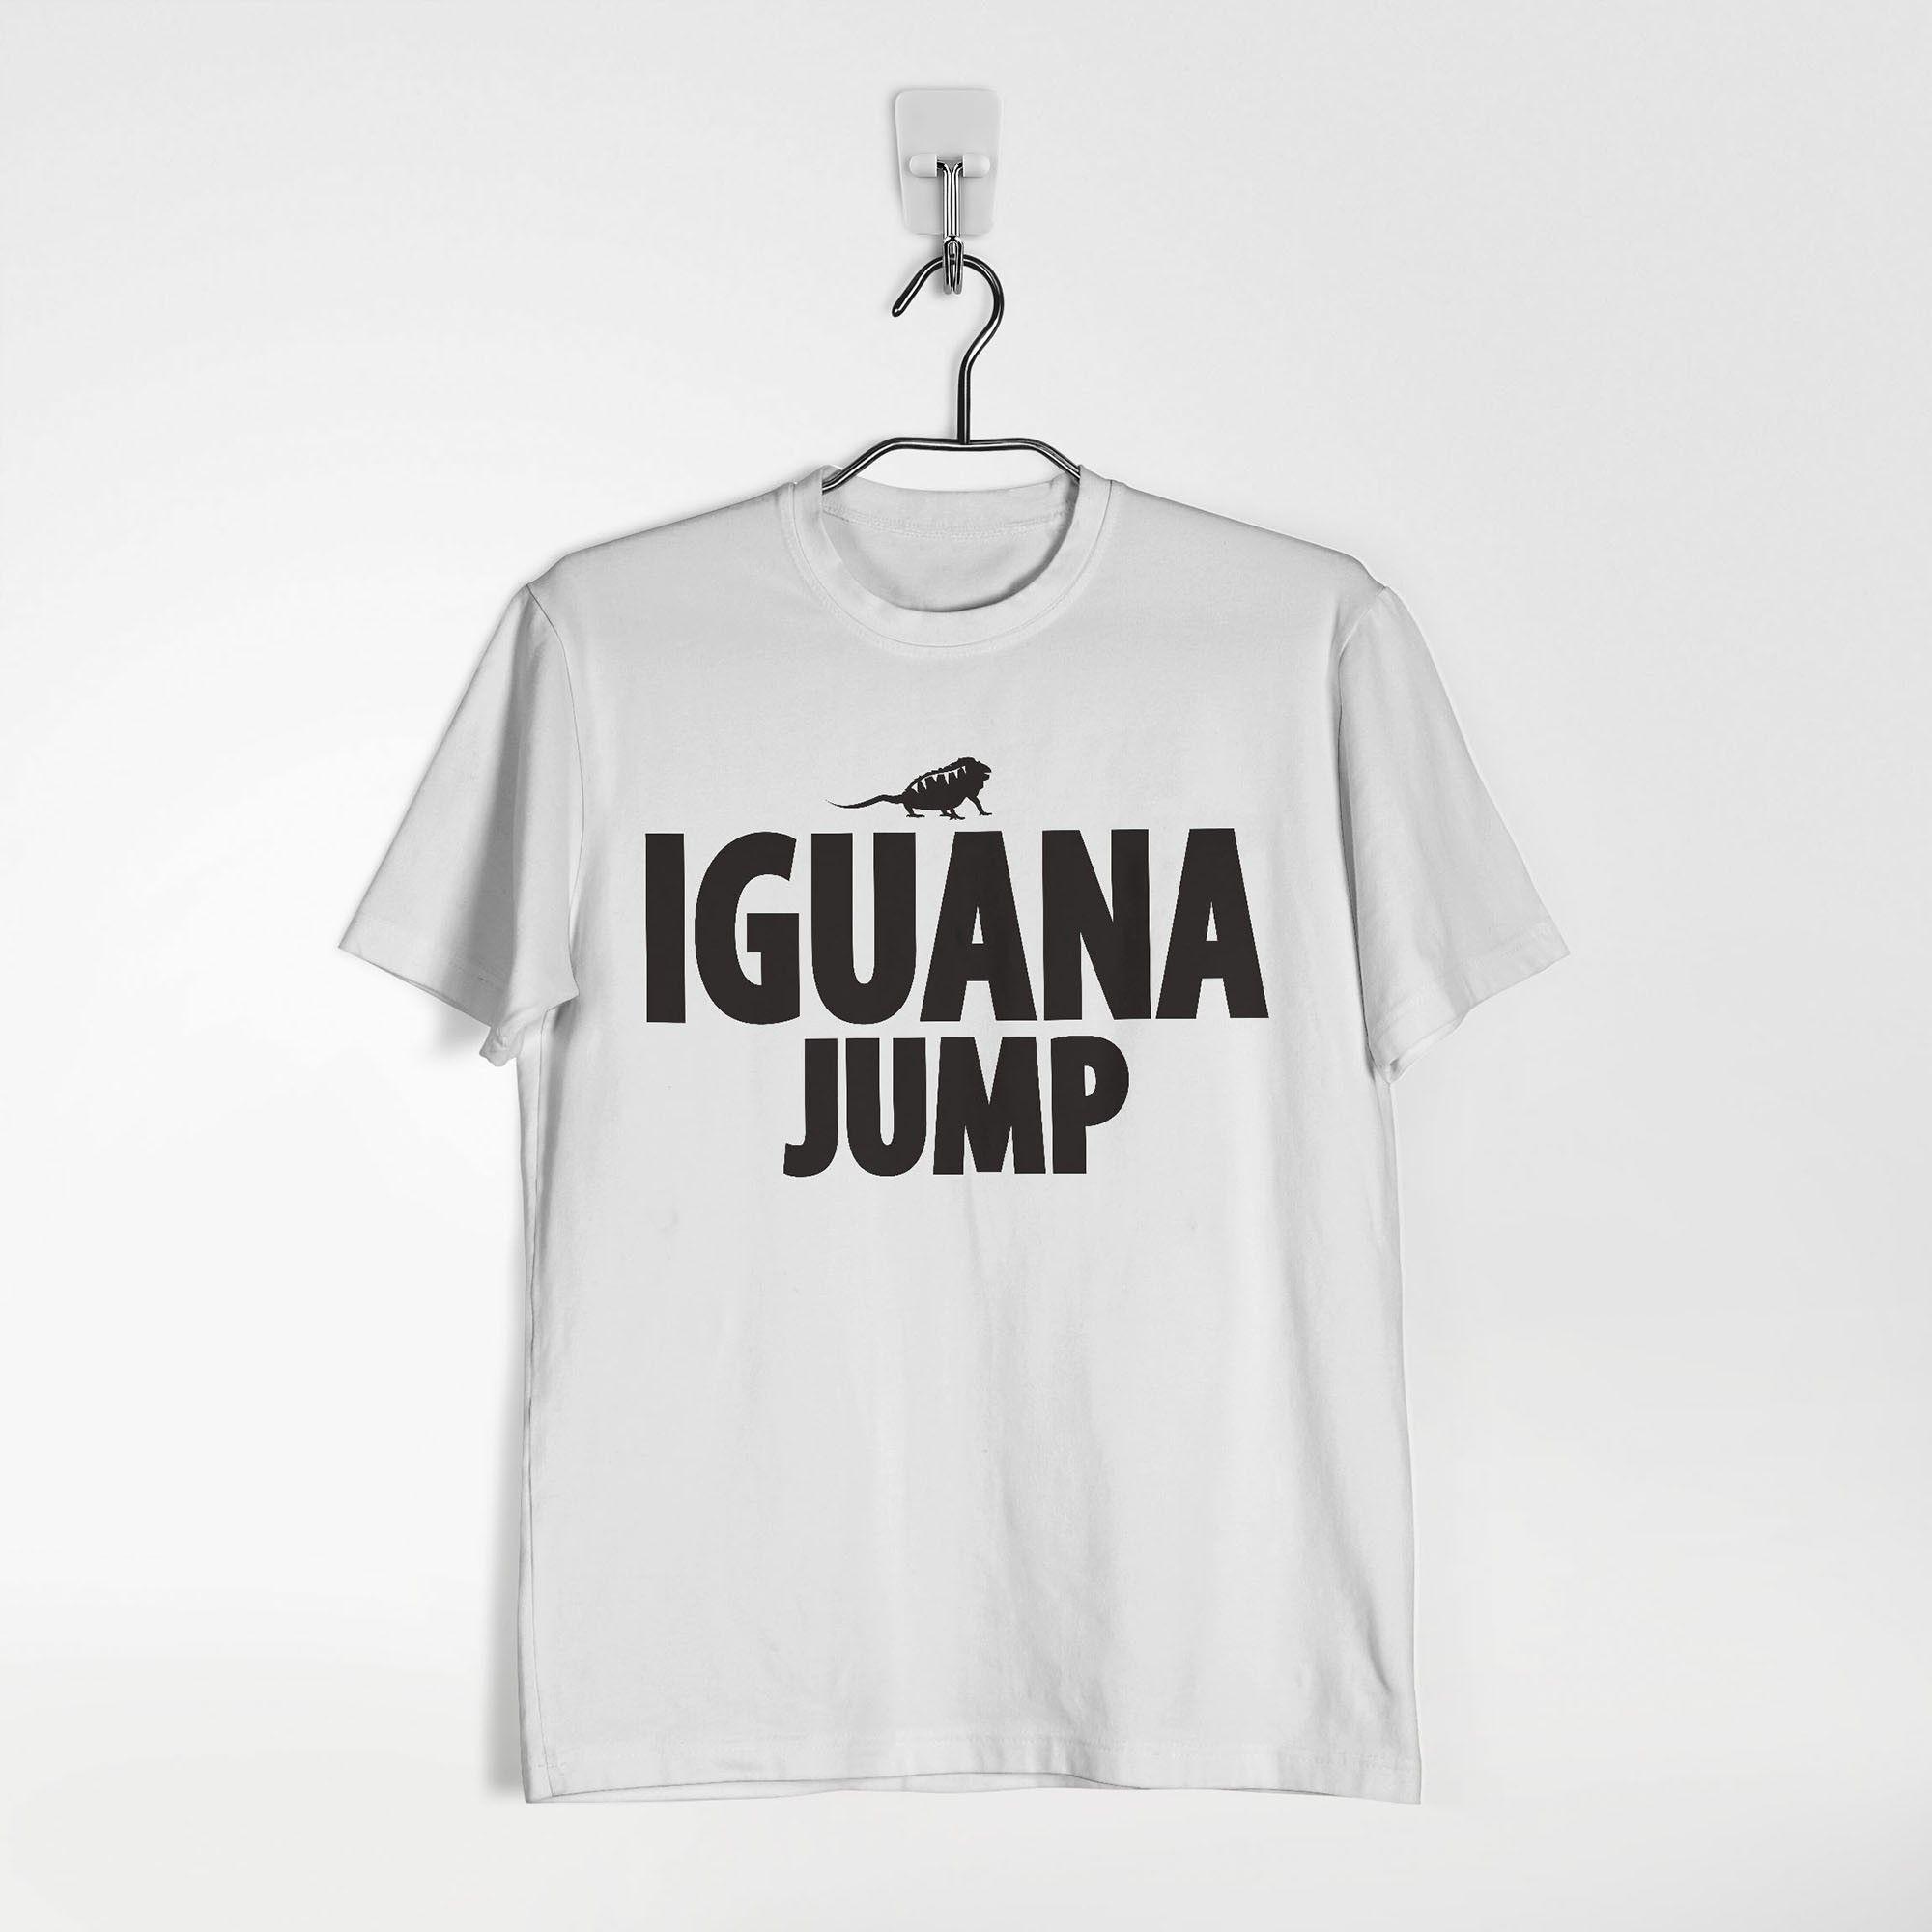 5c9ec7e75 Camiseta branca estampada preta iguana em 2018